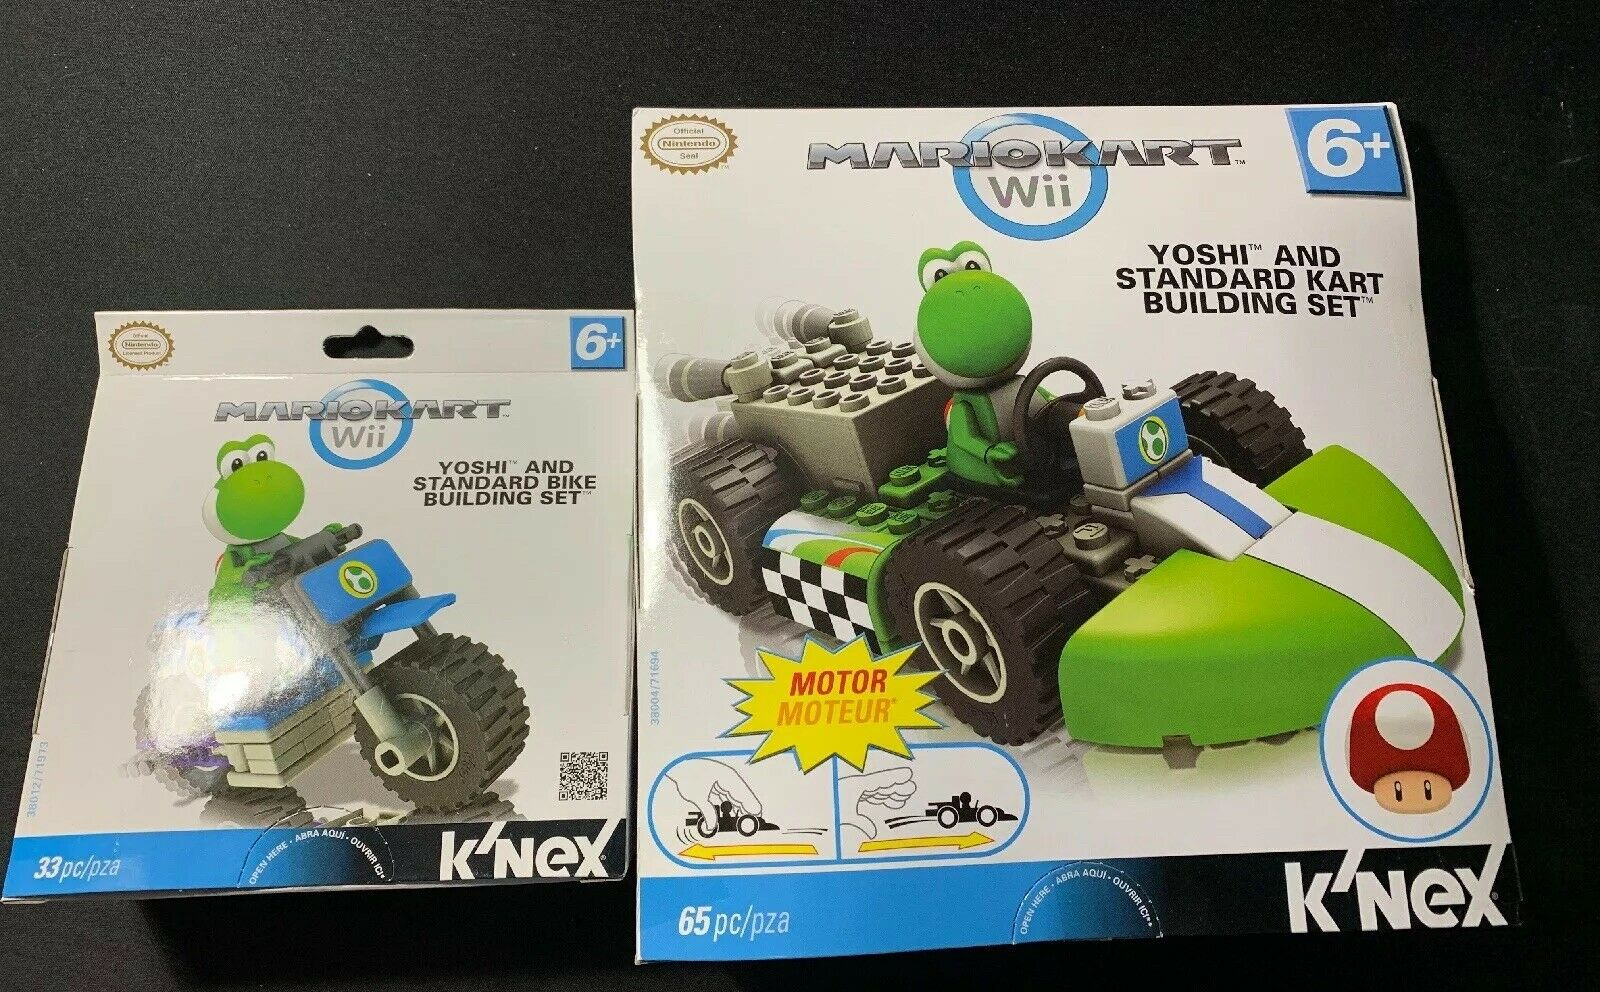 Wii Mario Kart - Yoshi Standard Kart + Bike Building Sets K'nex